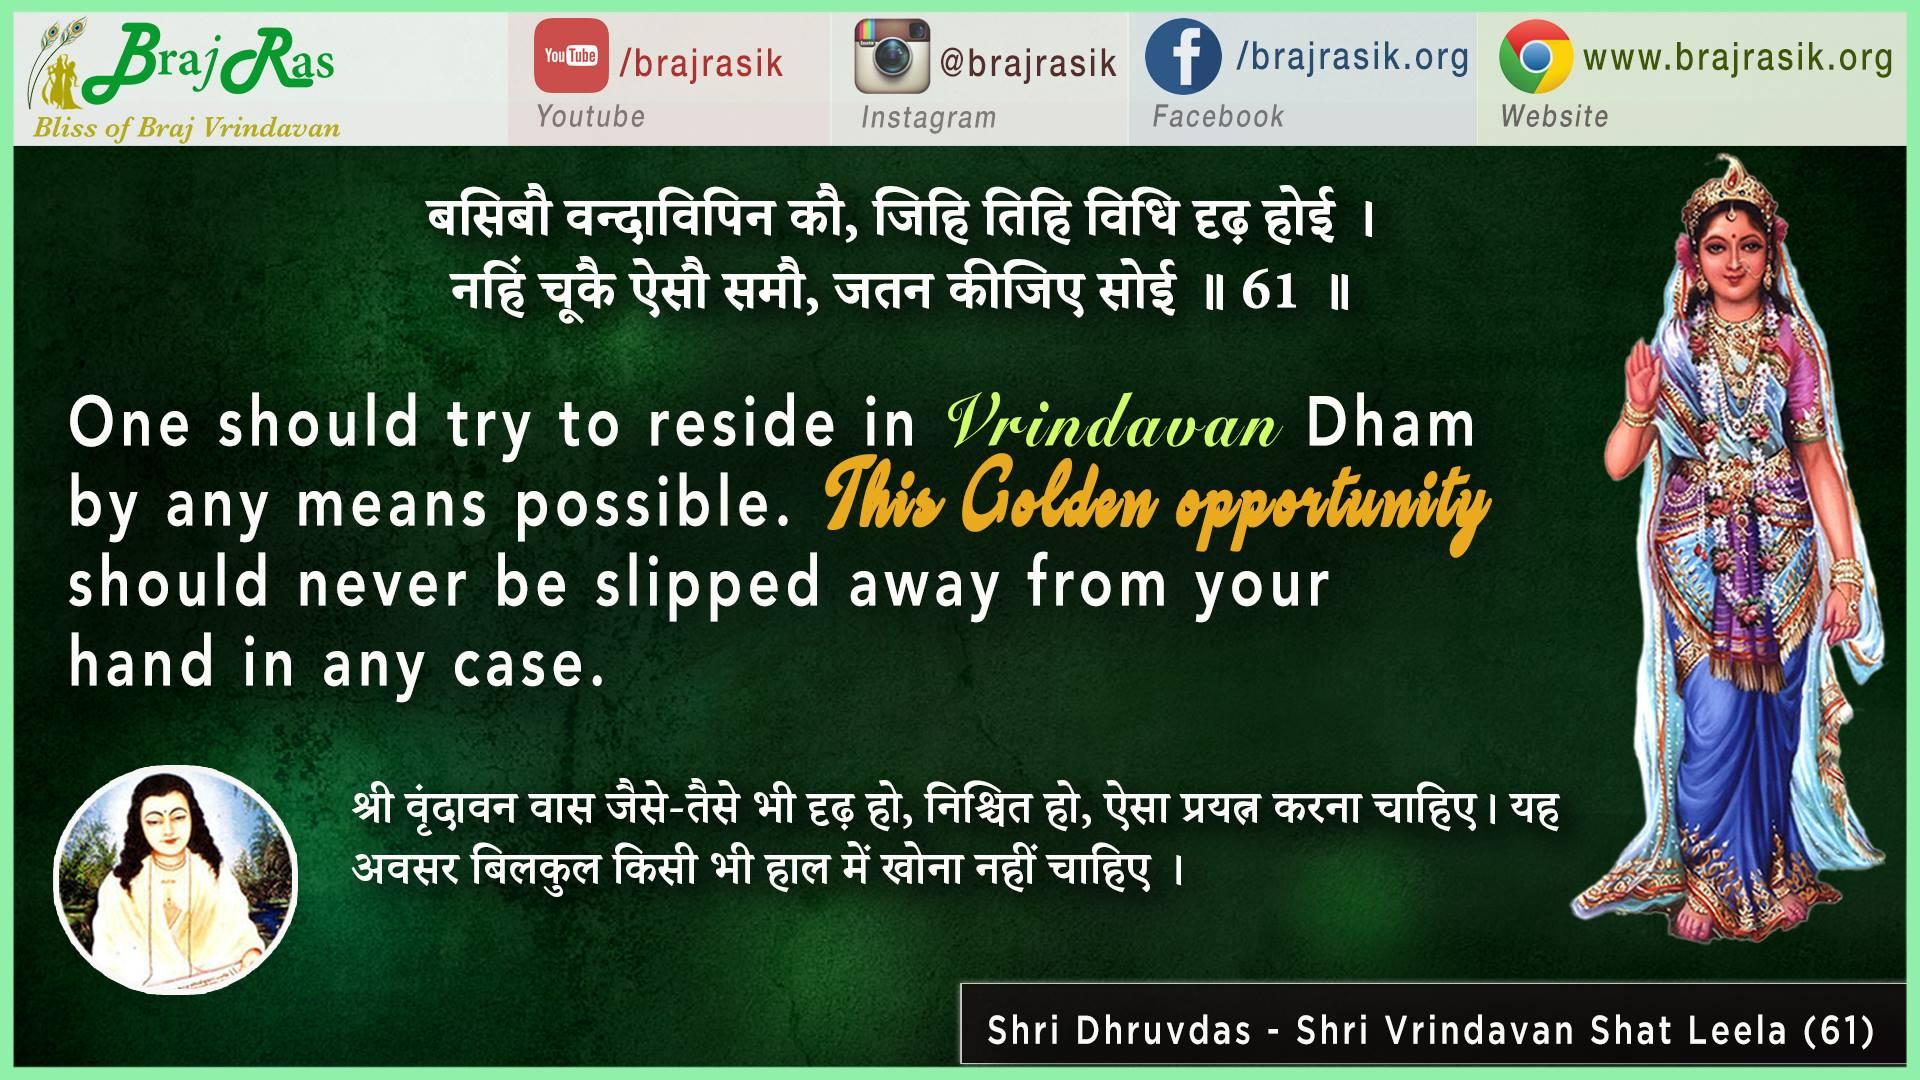 Basibo Vrindavipin Ko - Shri Dhruvdas - Shri Vrindavan Shat Leela